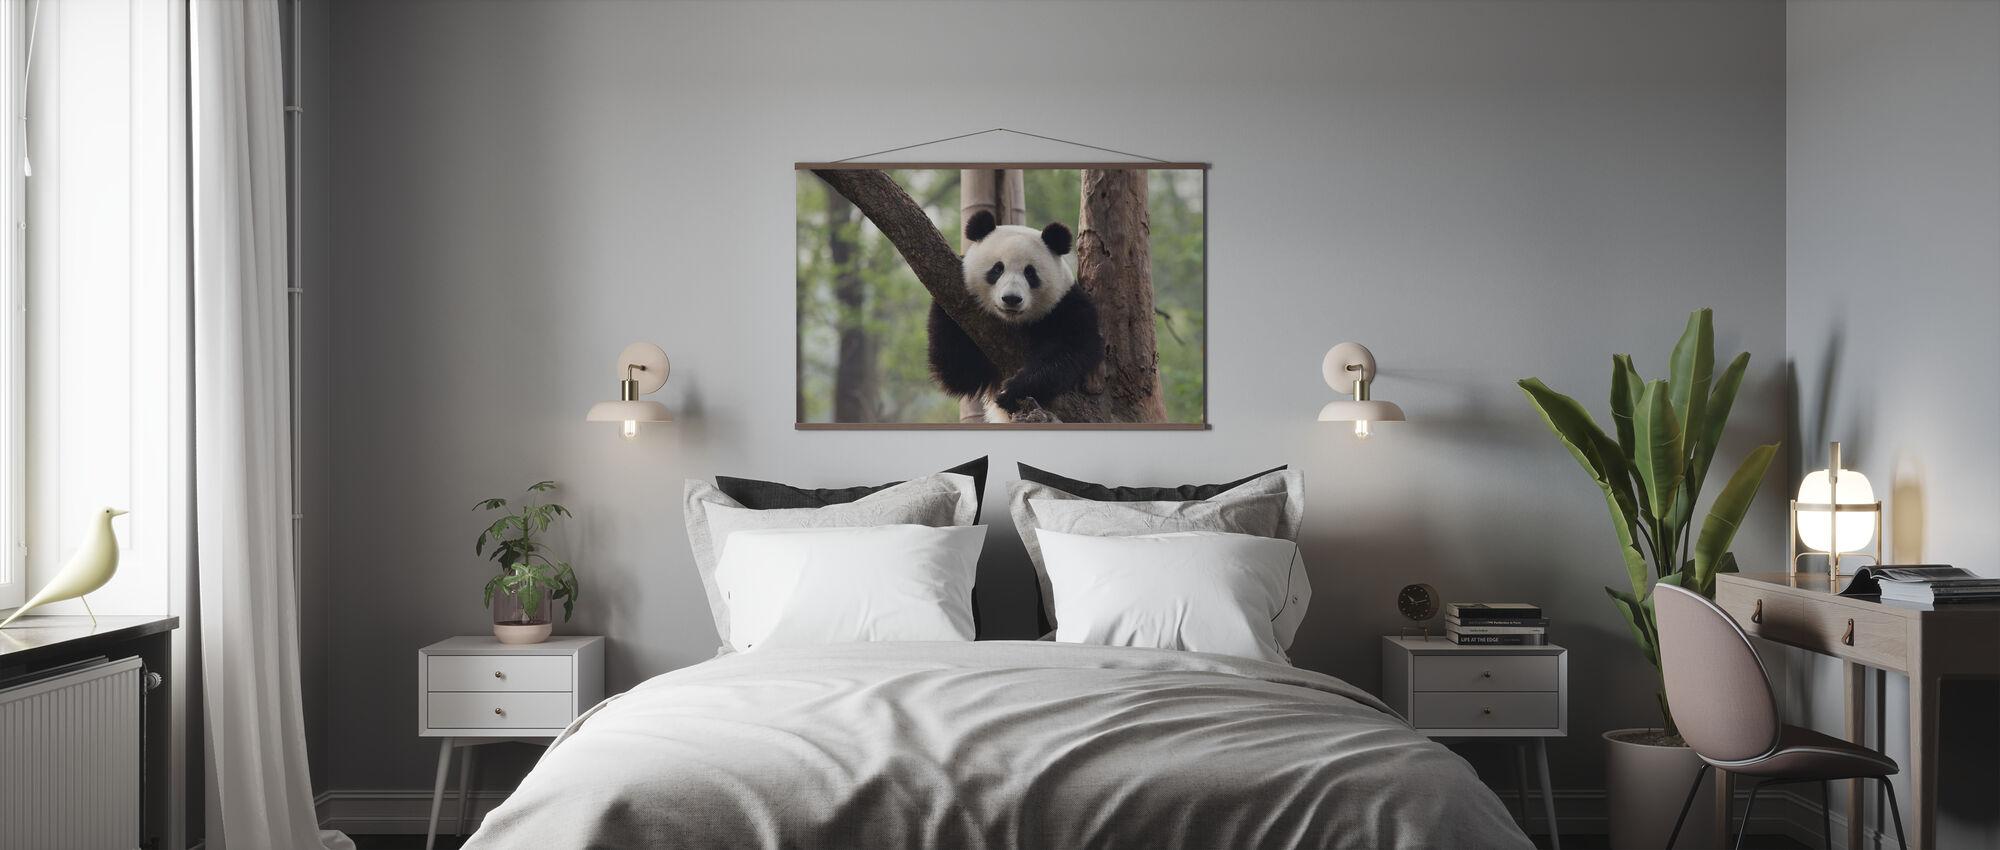 Sweet Panda - Poster - Bedroom